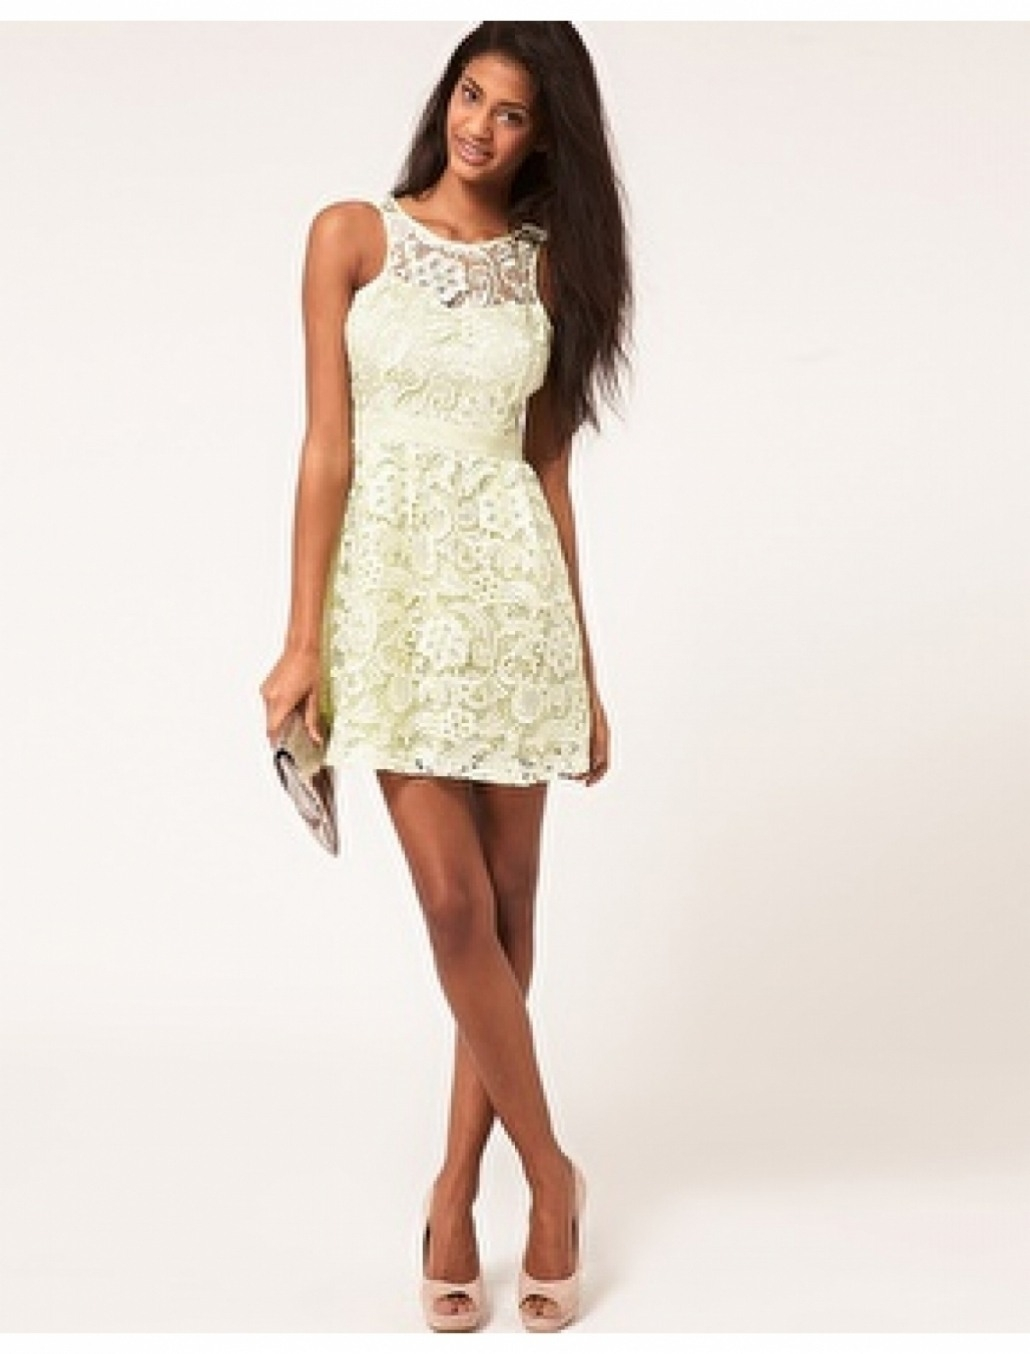 10 Genial Elegante Kleider Kurz StylishDesigner Spektakulär Elegante Kleider Kurz für 2019